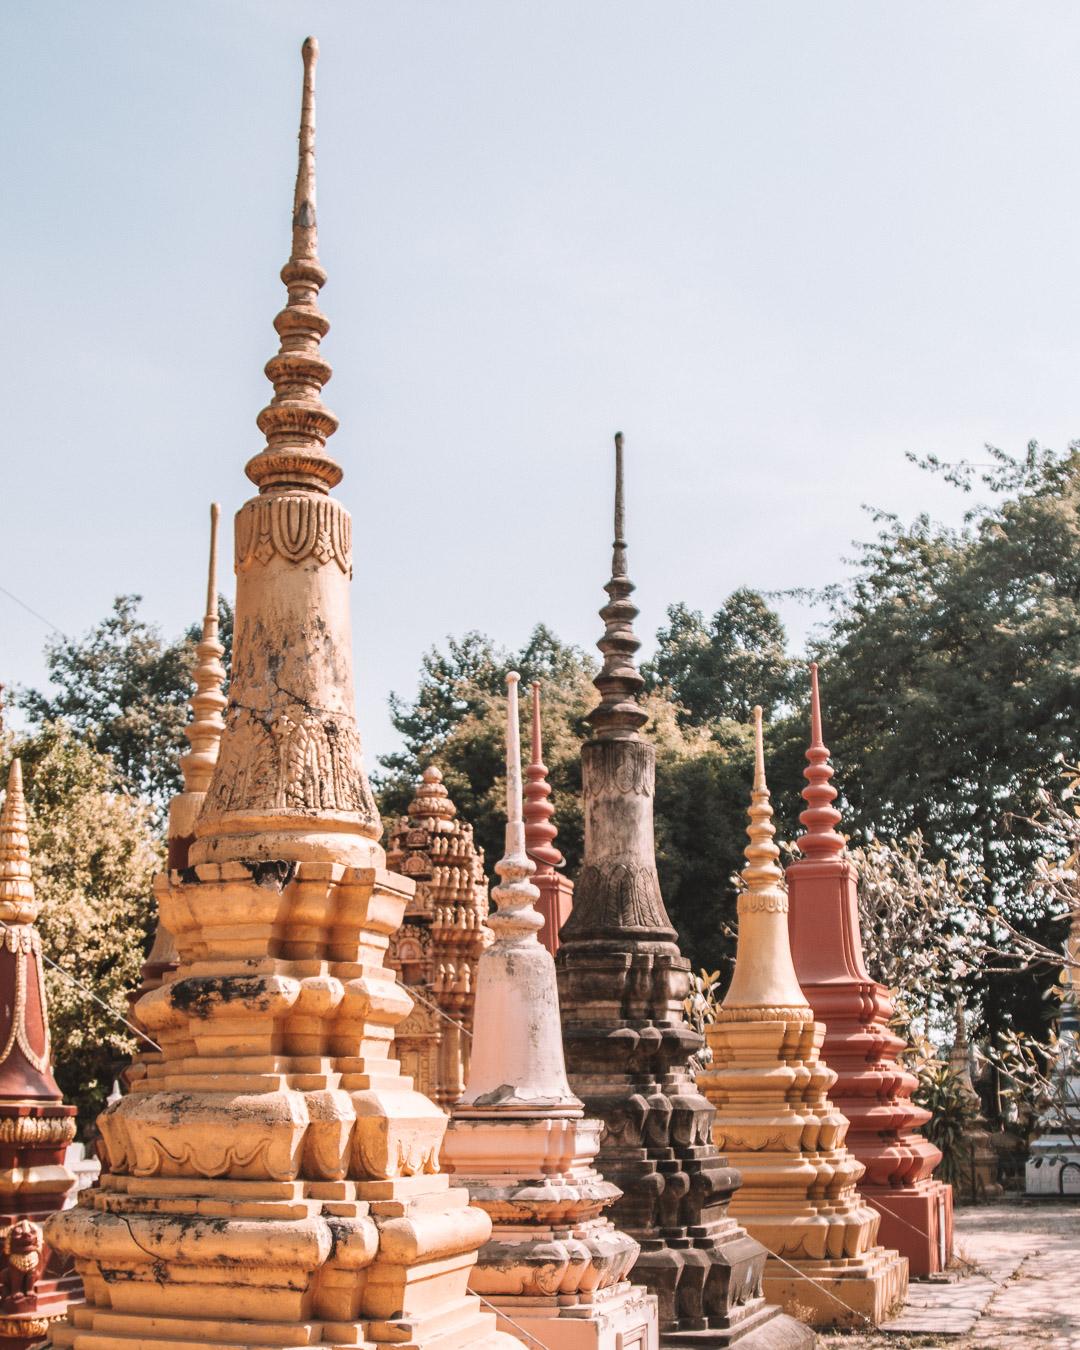 cambodia pagodas